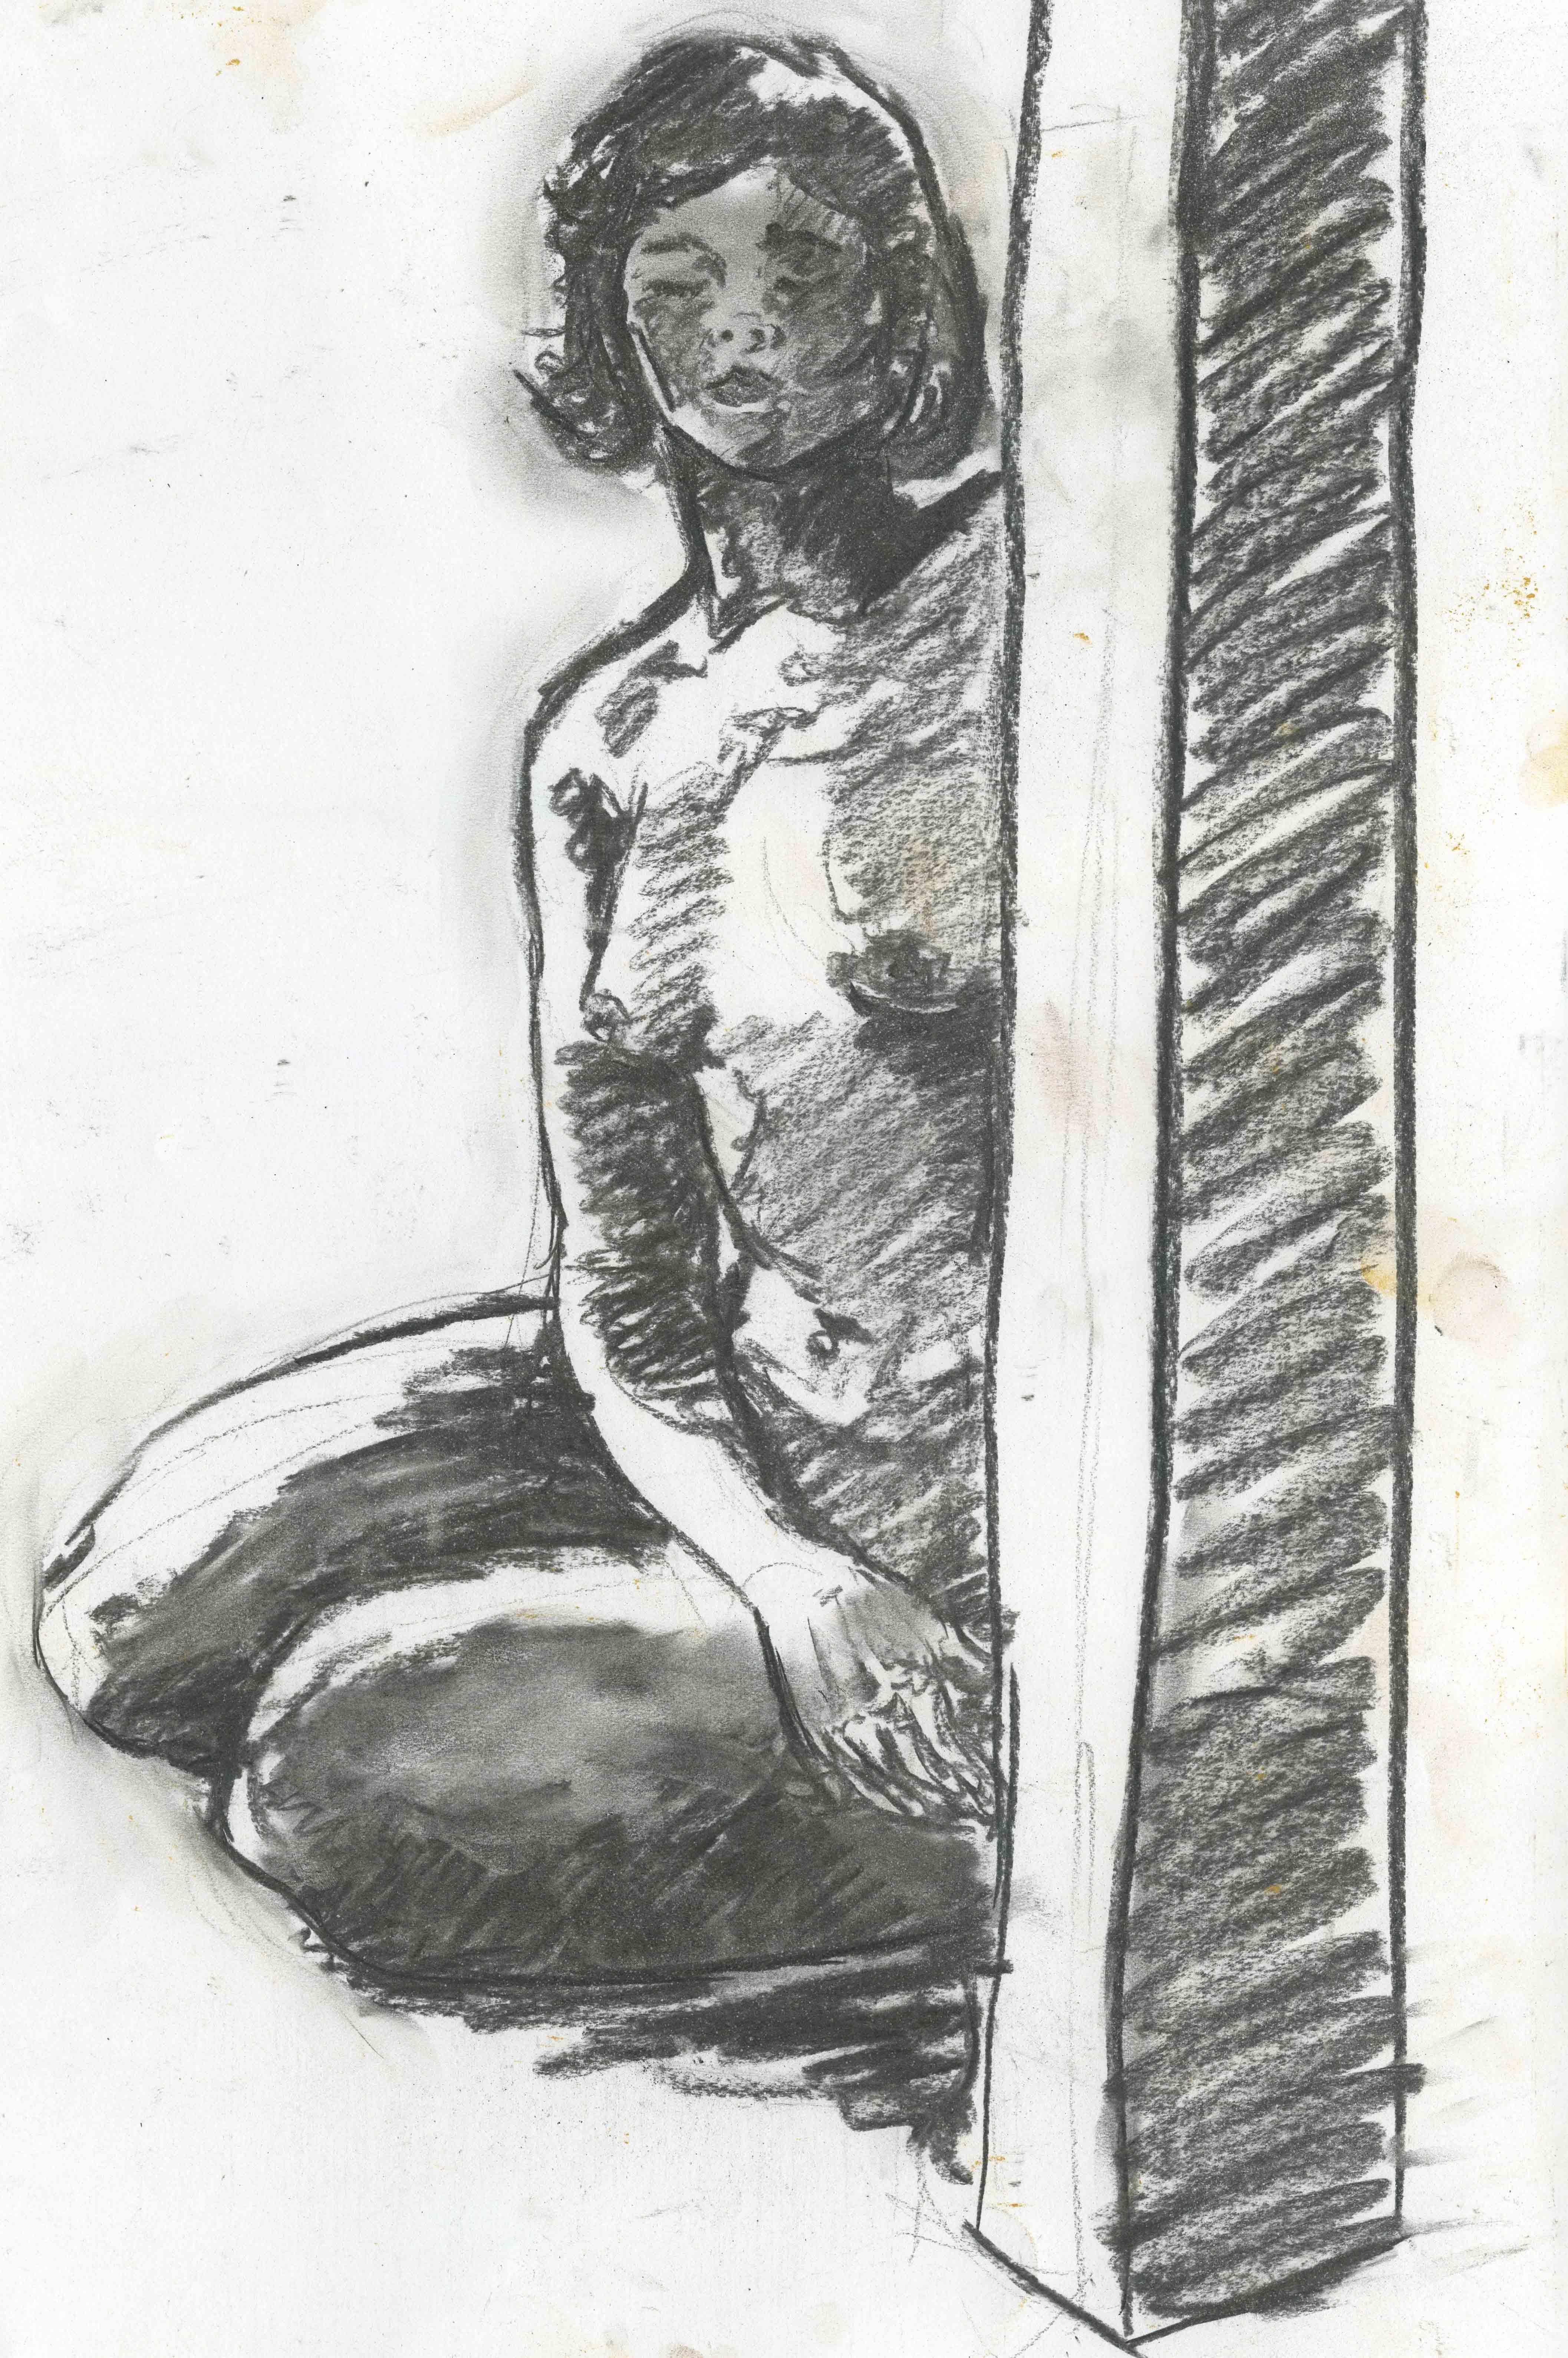 Noomis - Etudes, croquis & Wip [ Nudité ] - Page 2 16042011271669853